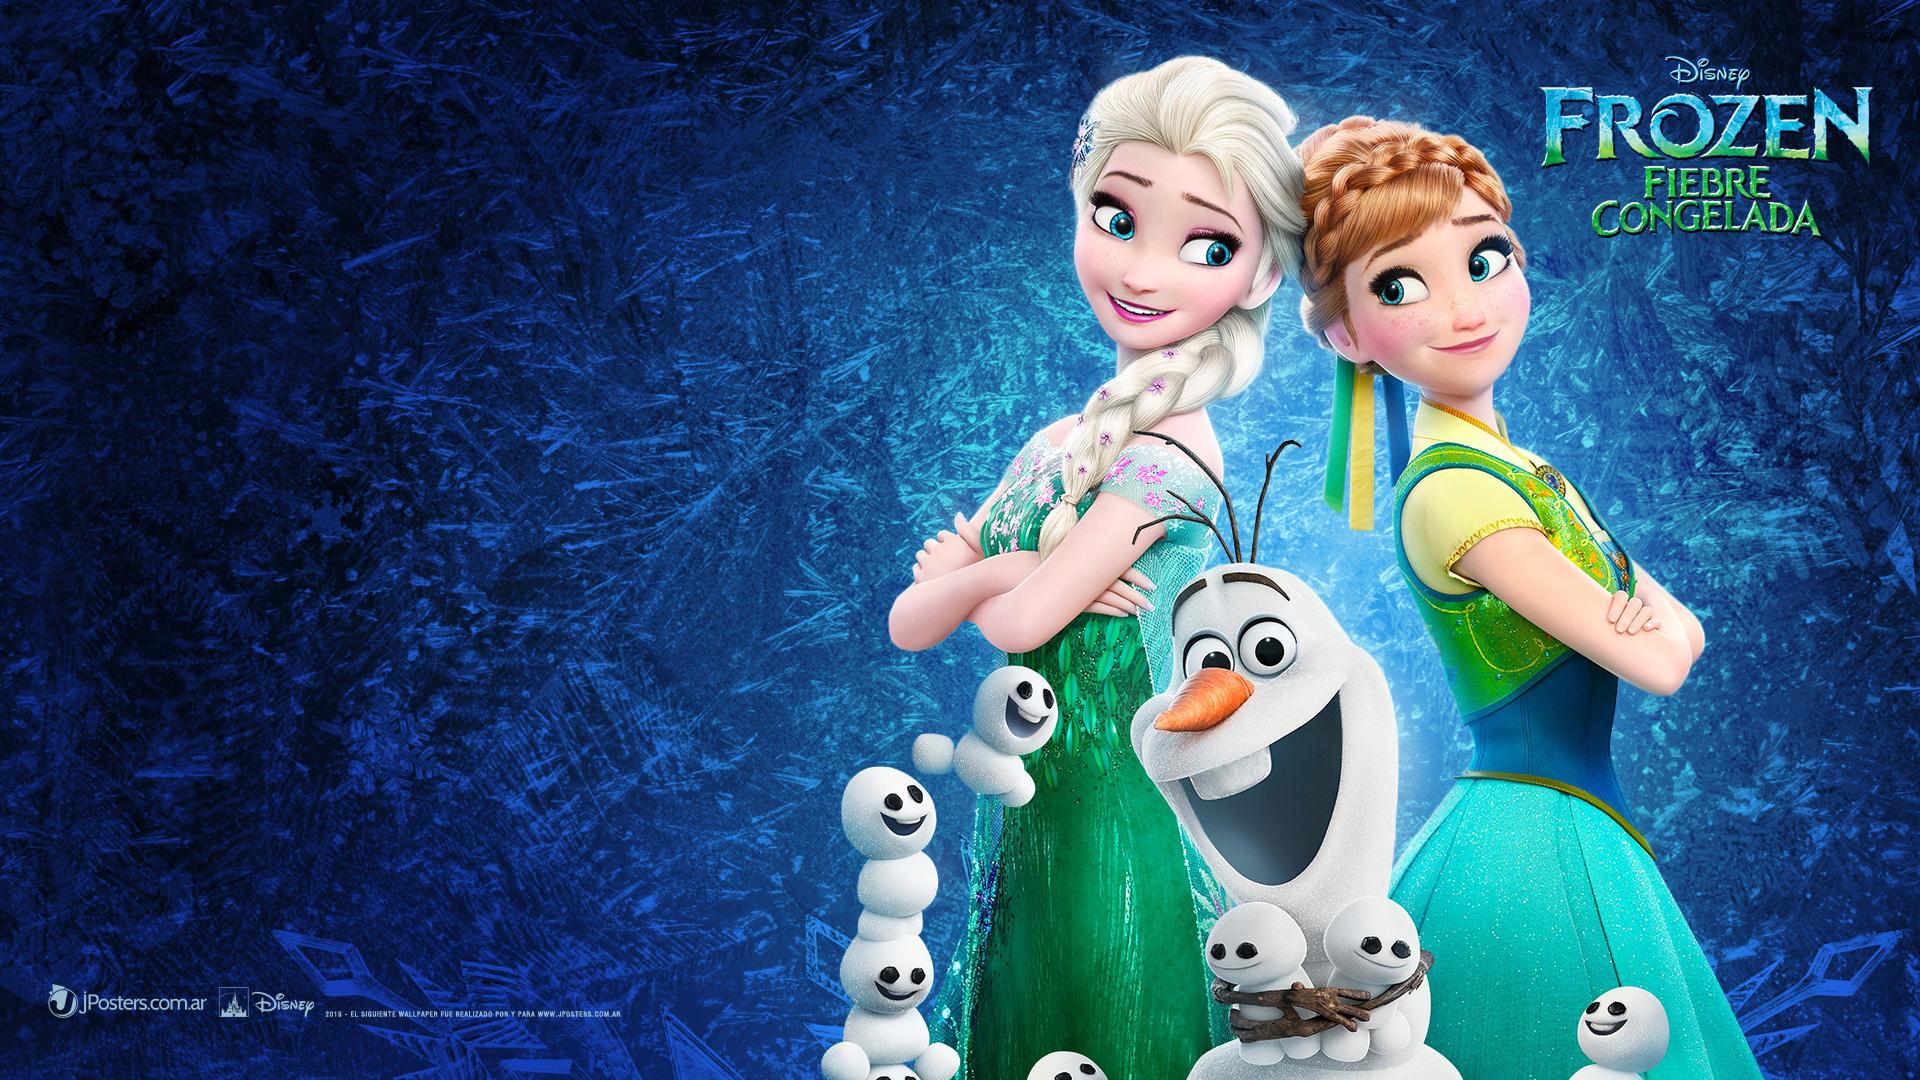 frozen wallpaper elsa and anna,animated cartoon,cartoon,animation,action figure,figurine